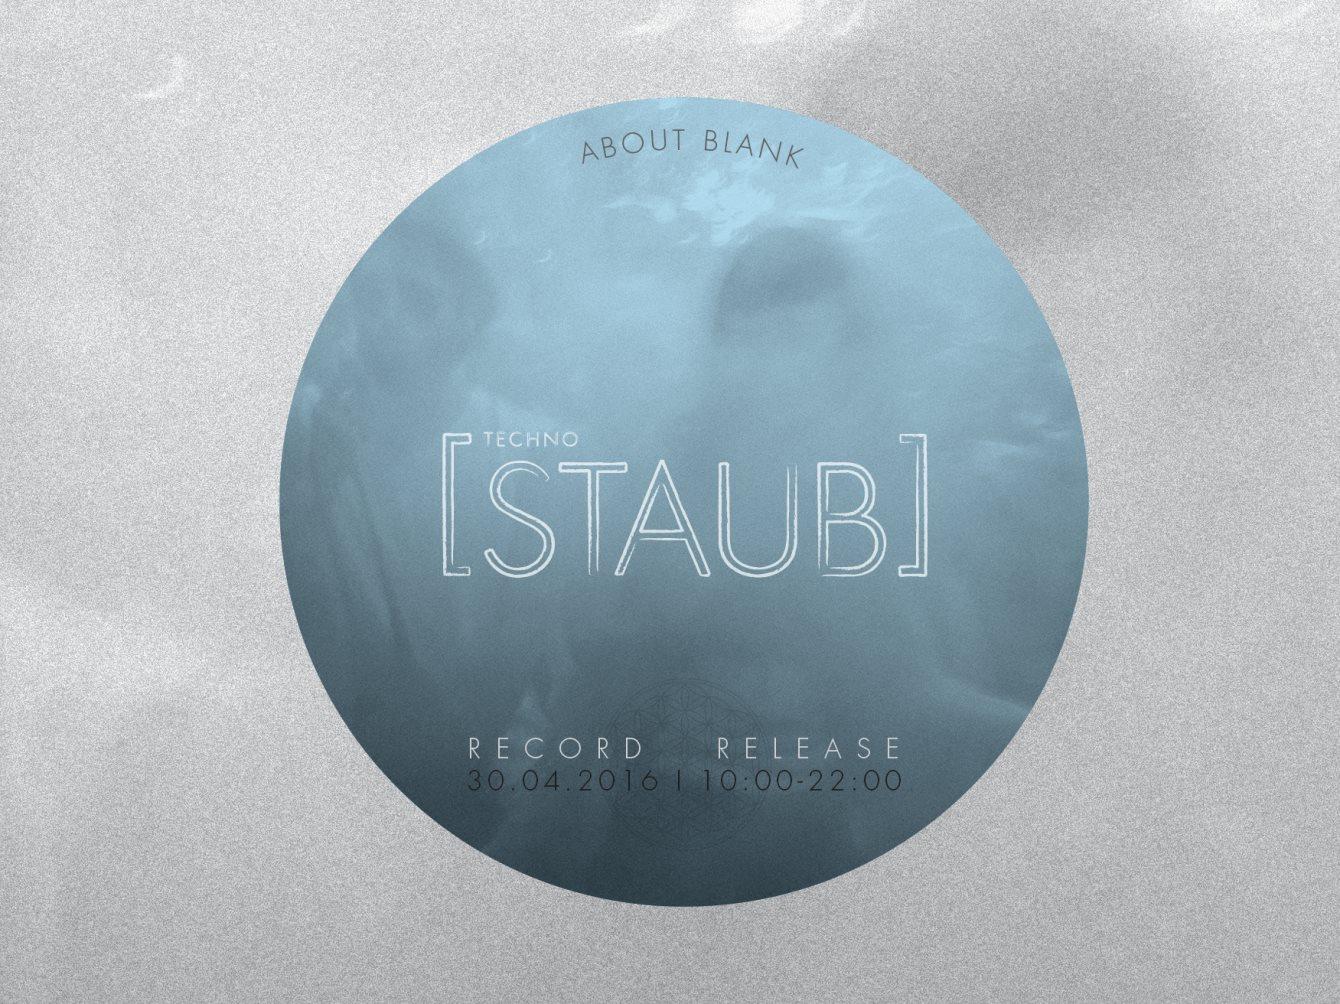 staub20160430